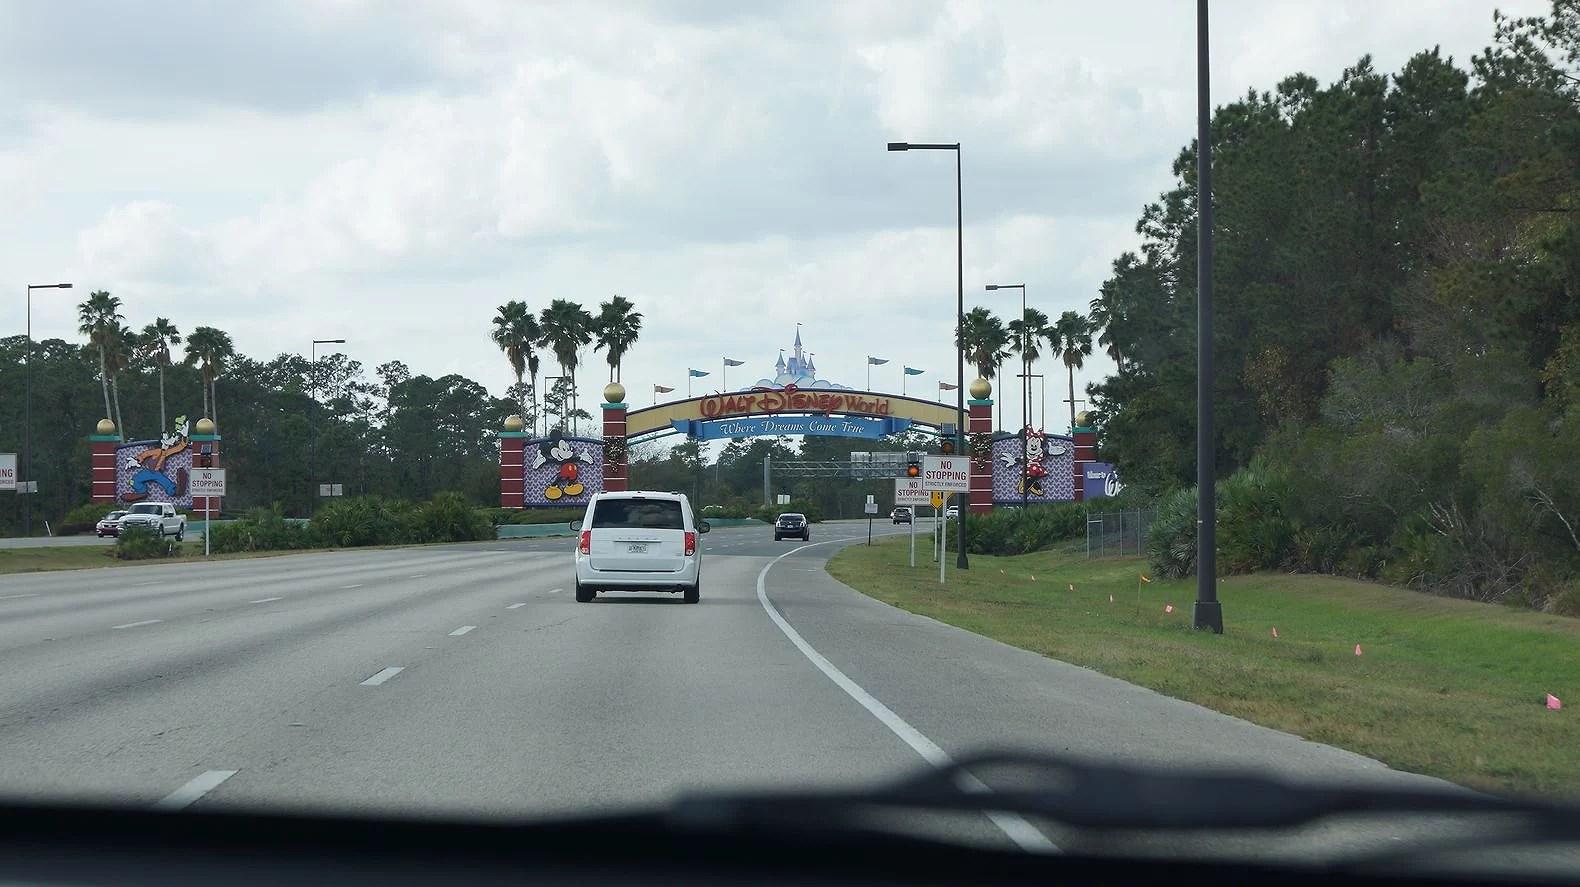 Walt Disney World har höjt sina biljettpriser - Flerdagsbiljetter